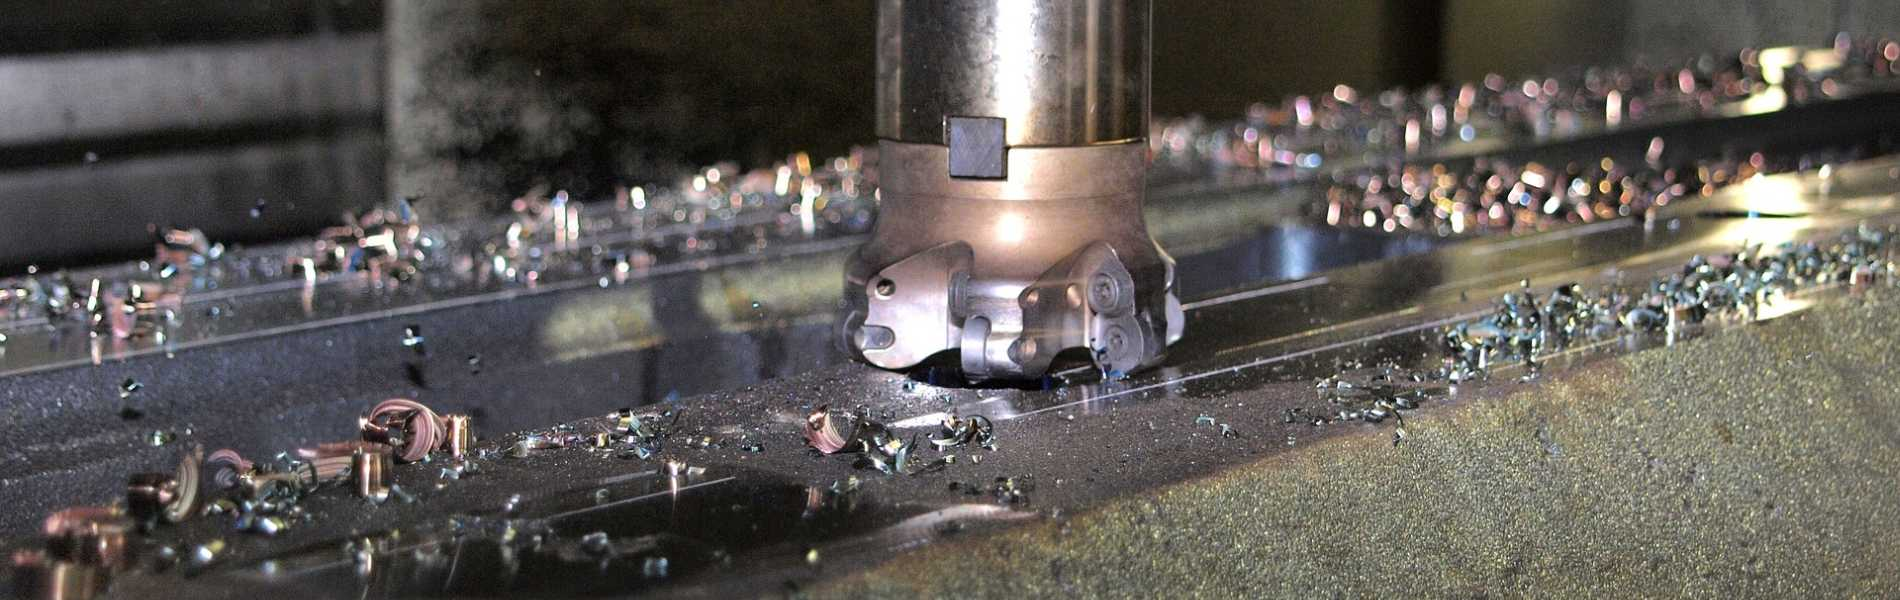 Tungsten Carbide and Ceramic Cutting Tools